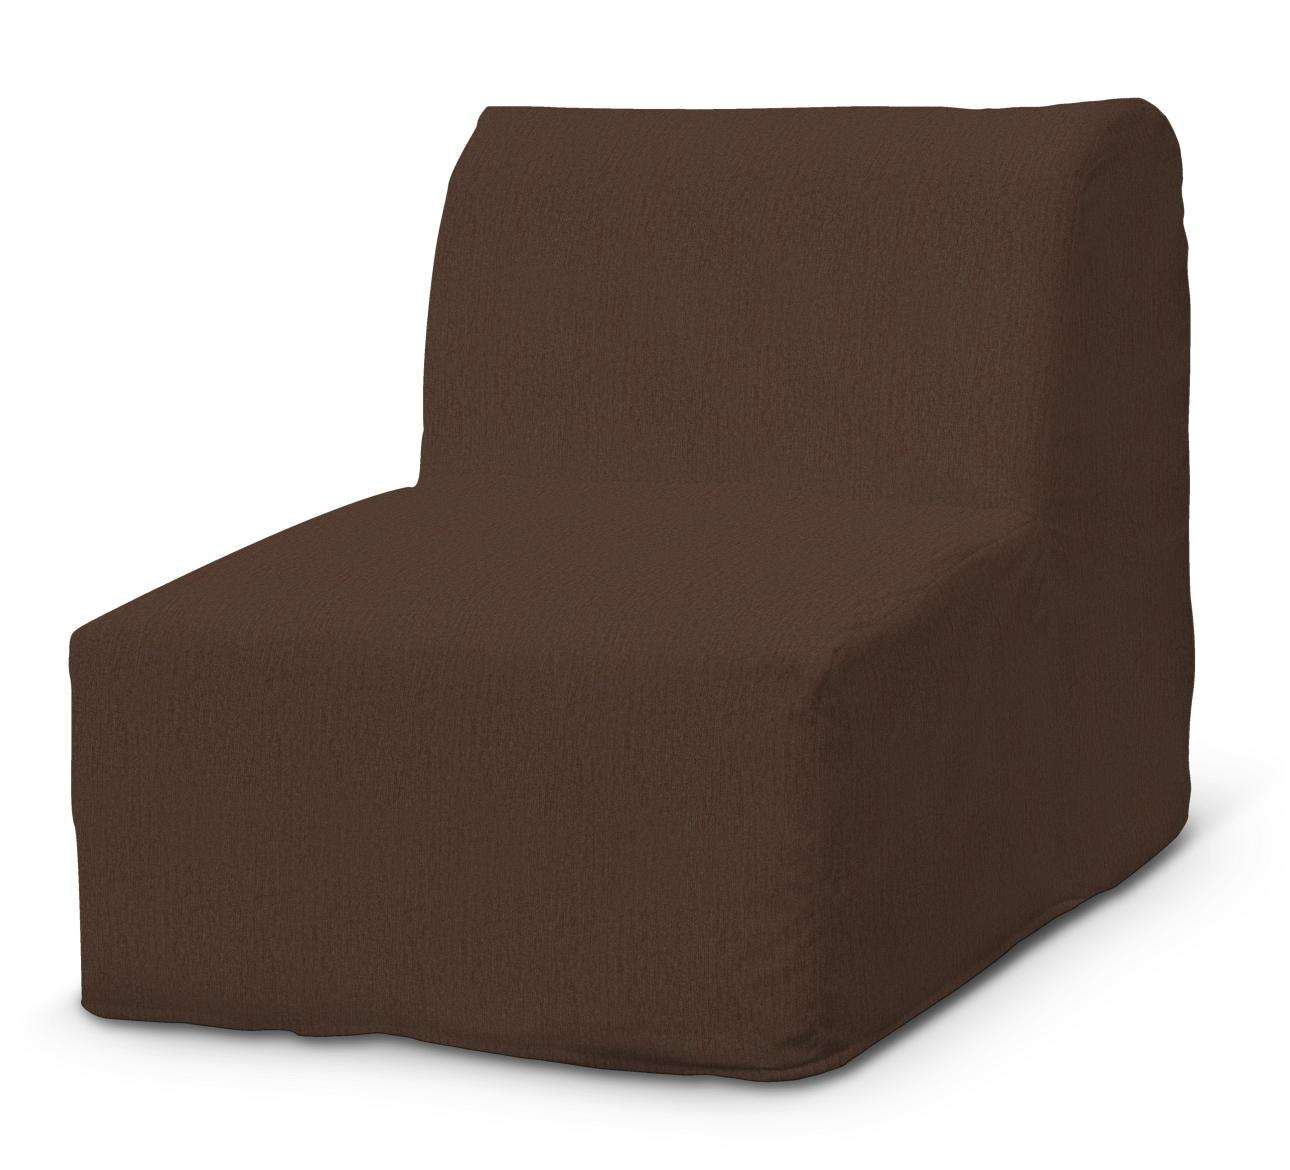 Lycksele betræk sove-lænestol fra kollektionen Chenille, Stof: 702-18